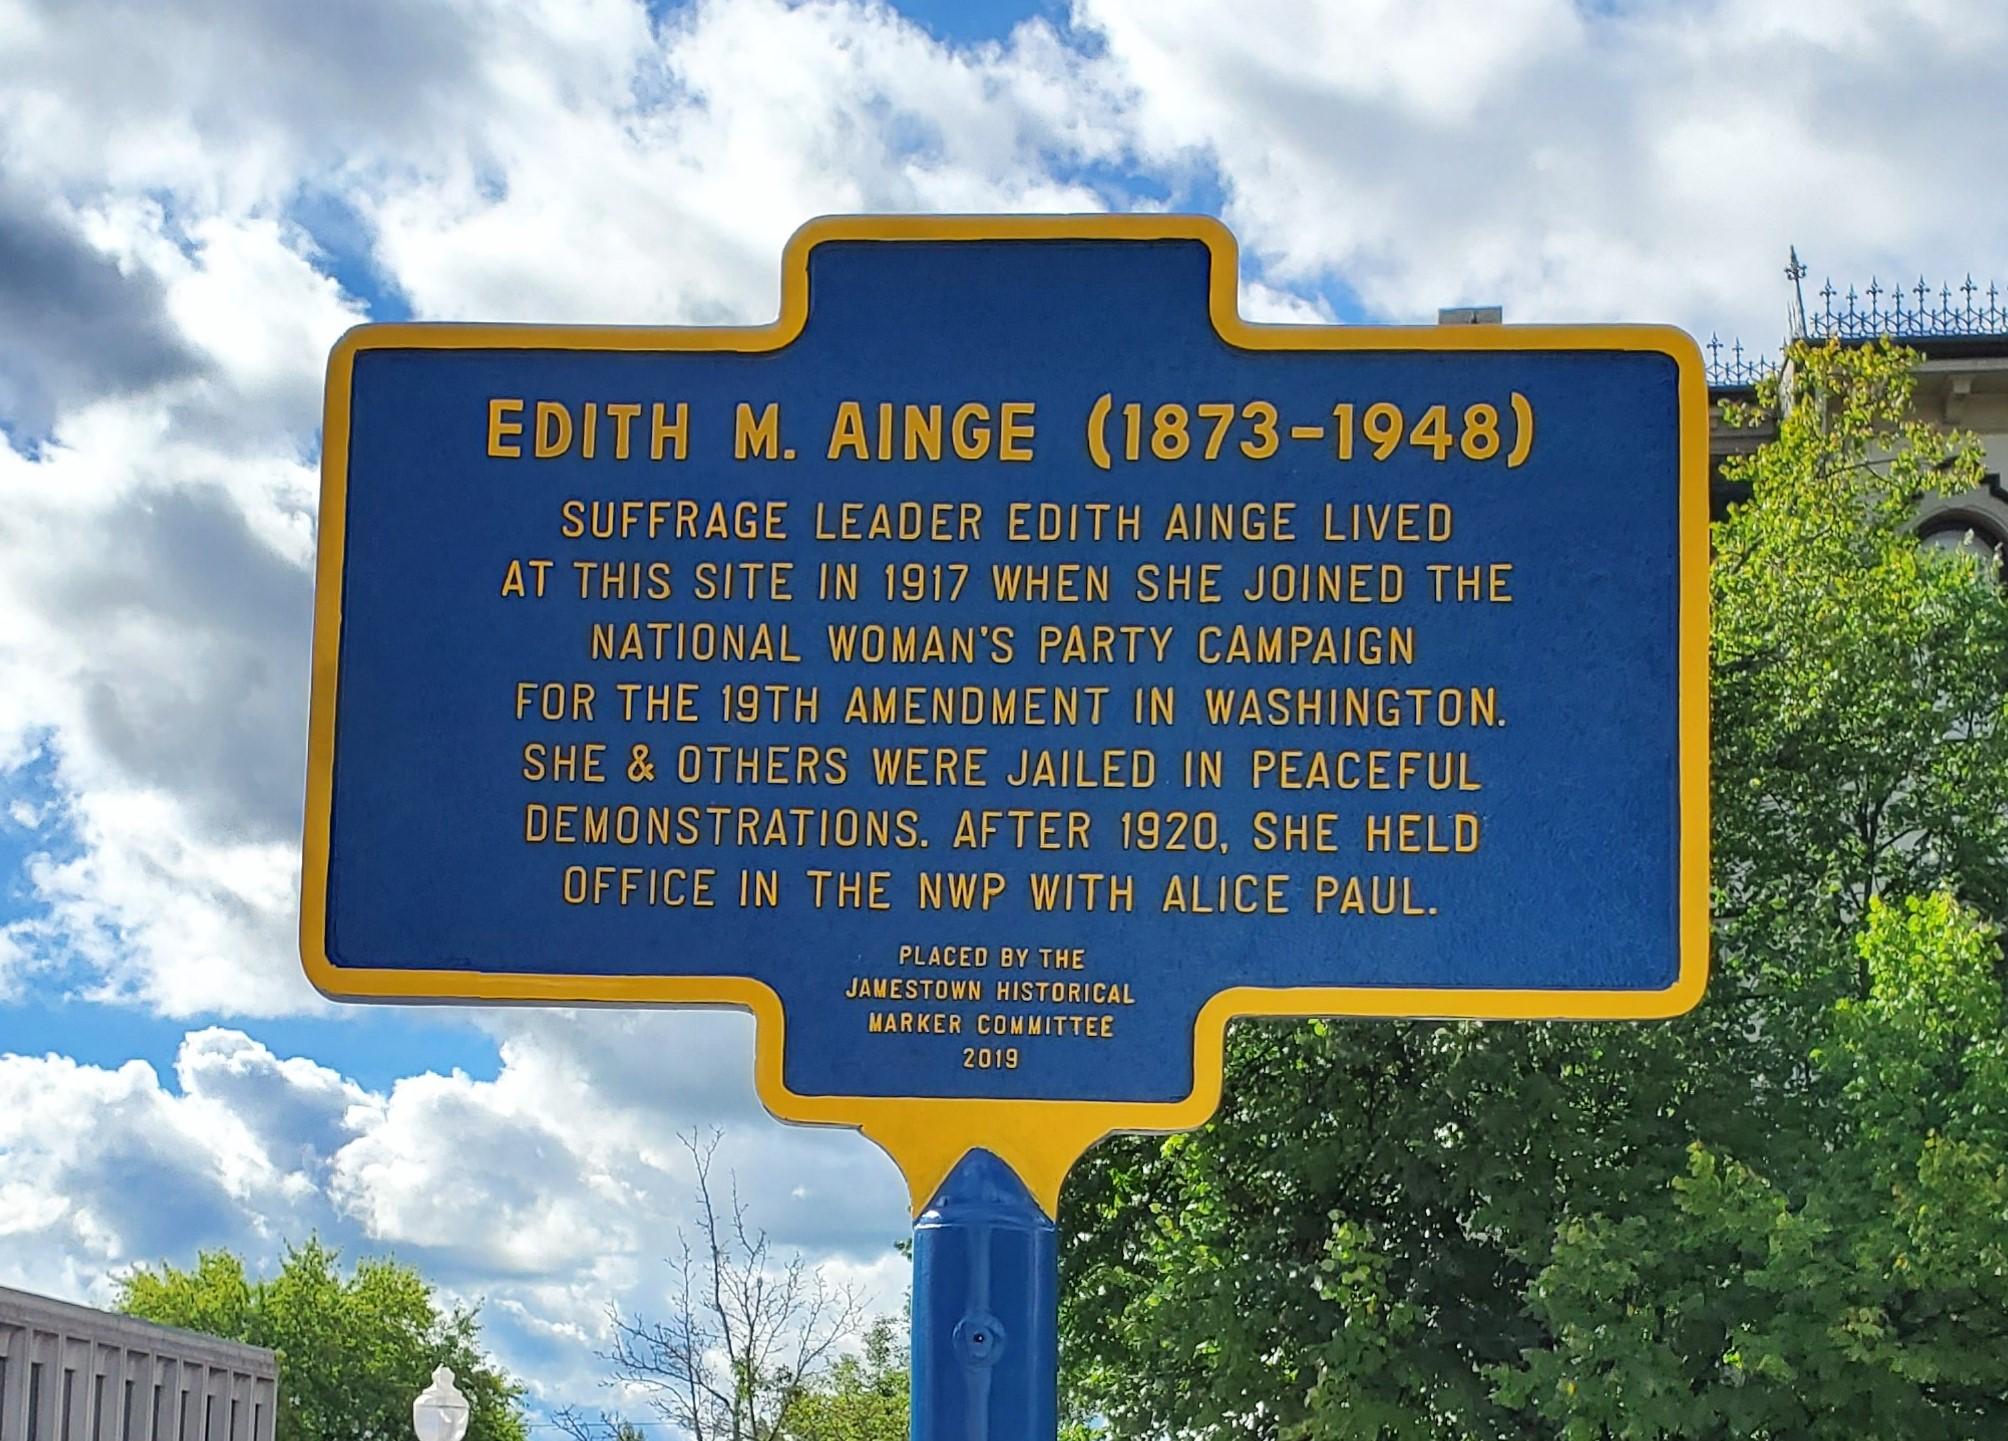 City of Jamestown historical marker honoring Edith Ainge, dedicated September 4, 2020.